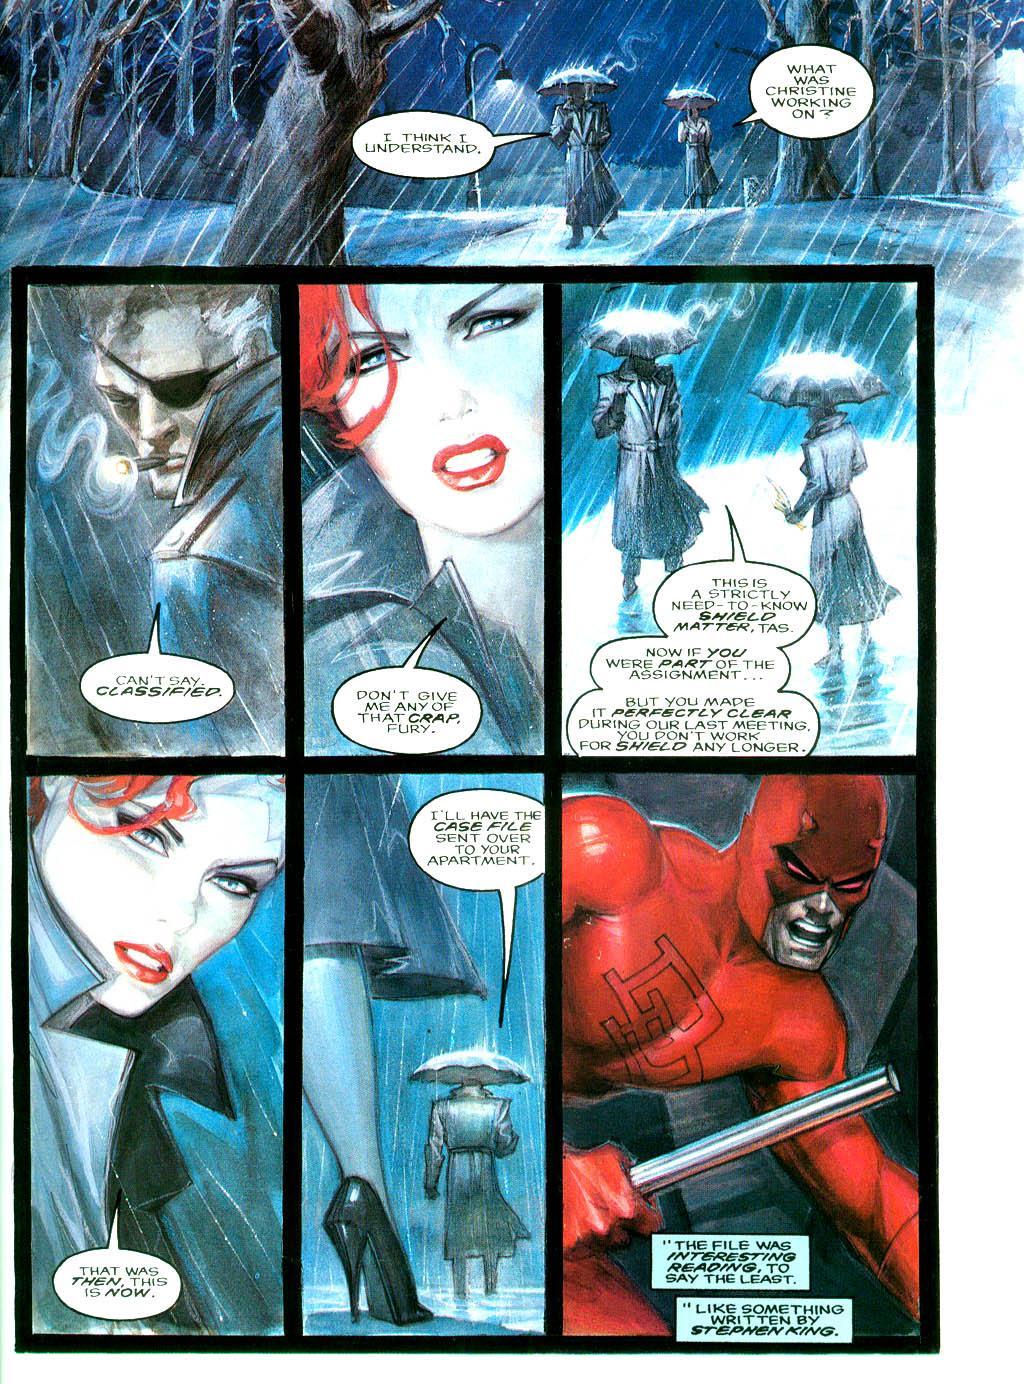 Daredevil Black Widow - Abattoir review